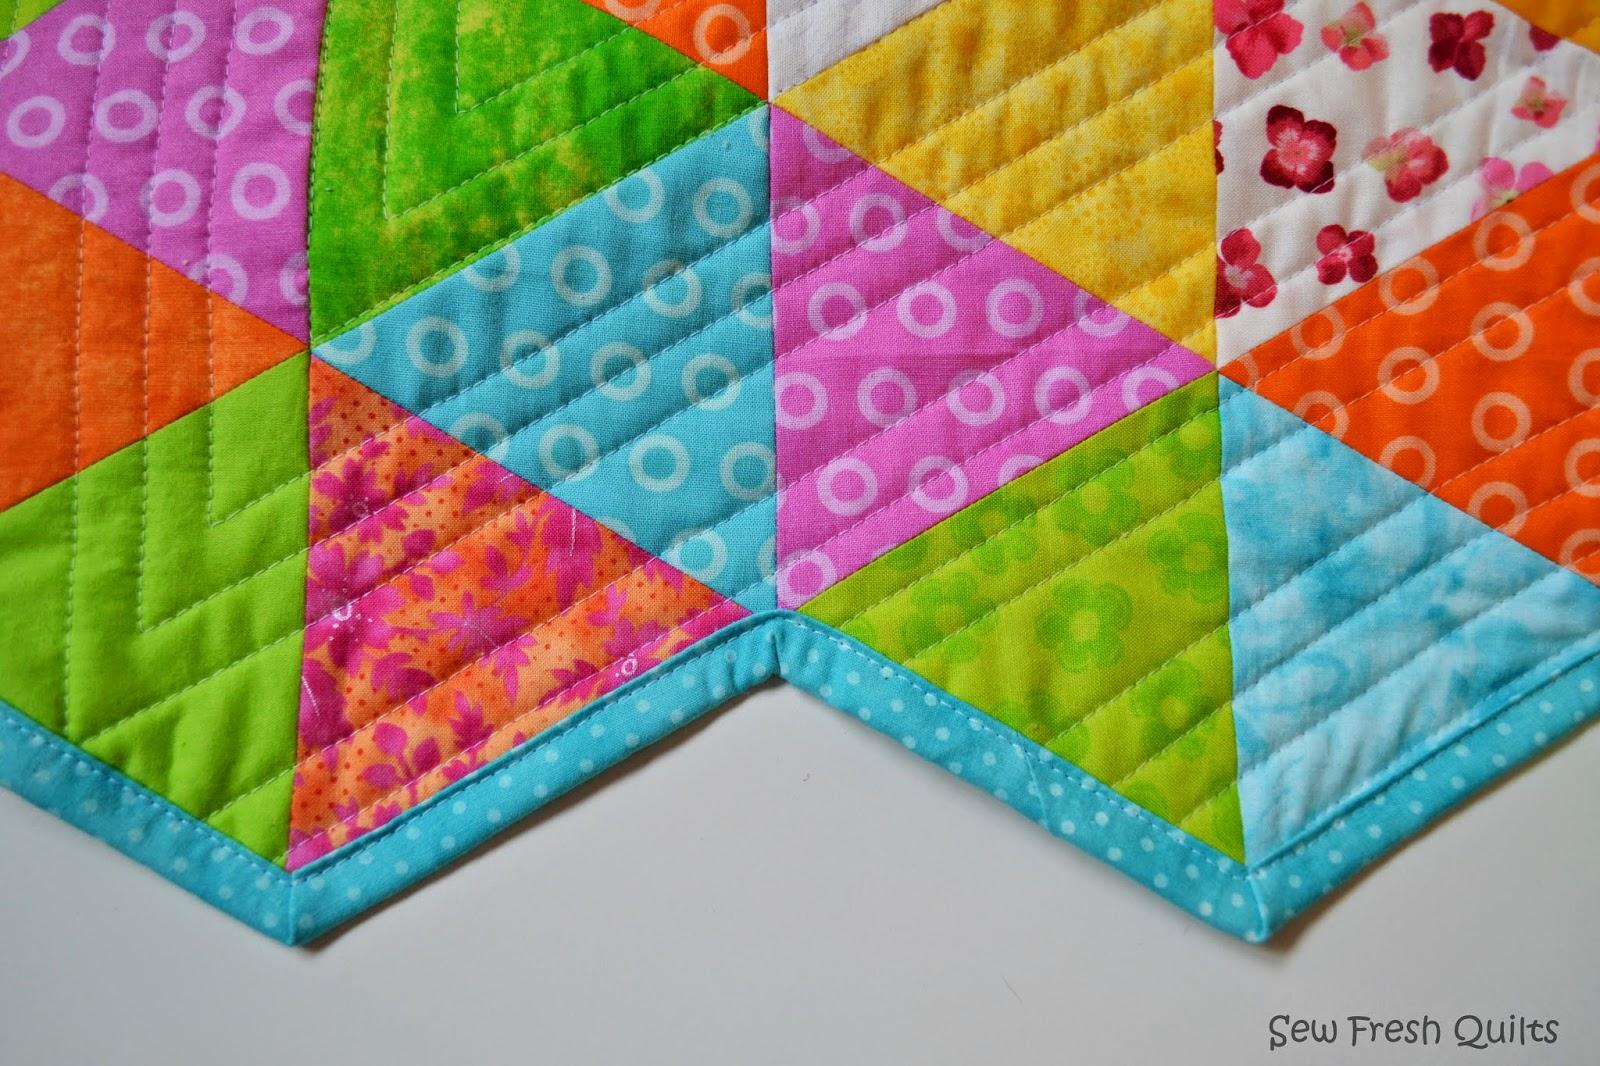 Sew Fresh Quilts: Binding Inside Corners Tutorial : sewing binding on quilt corners - Adamdwight.com